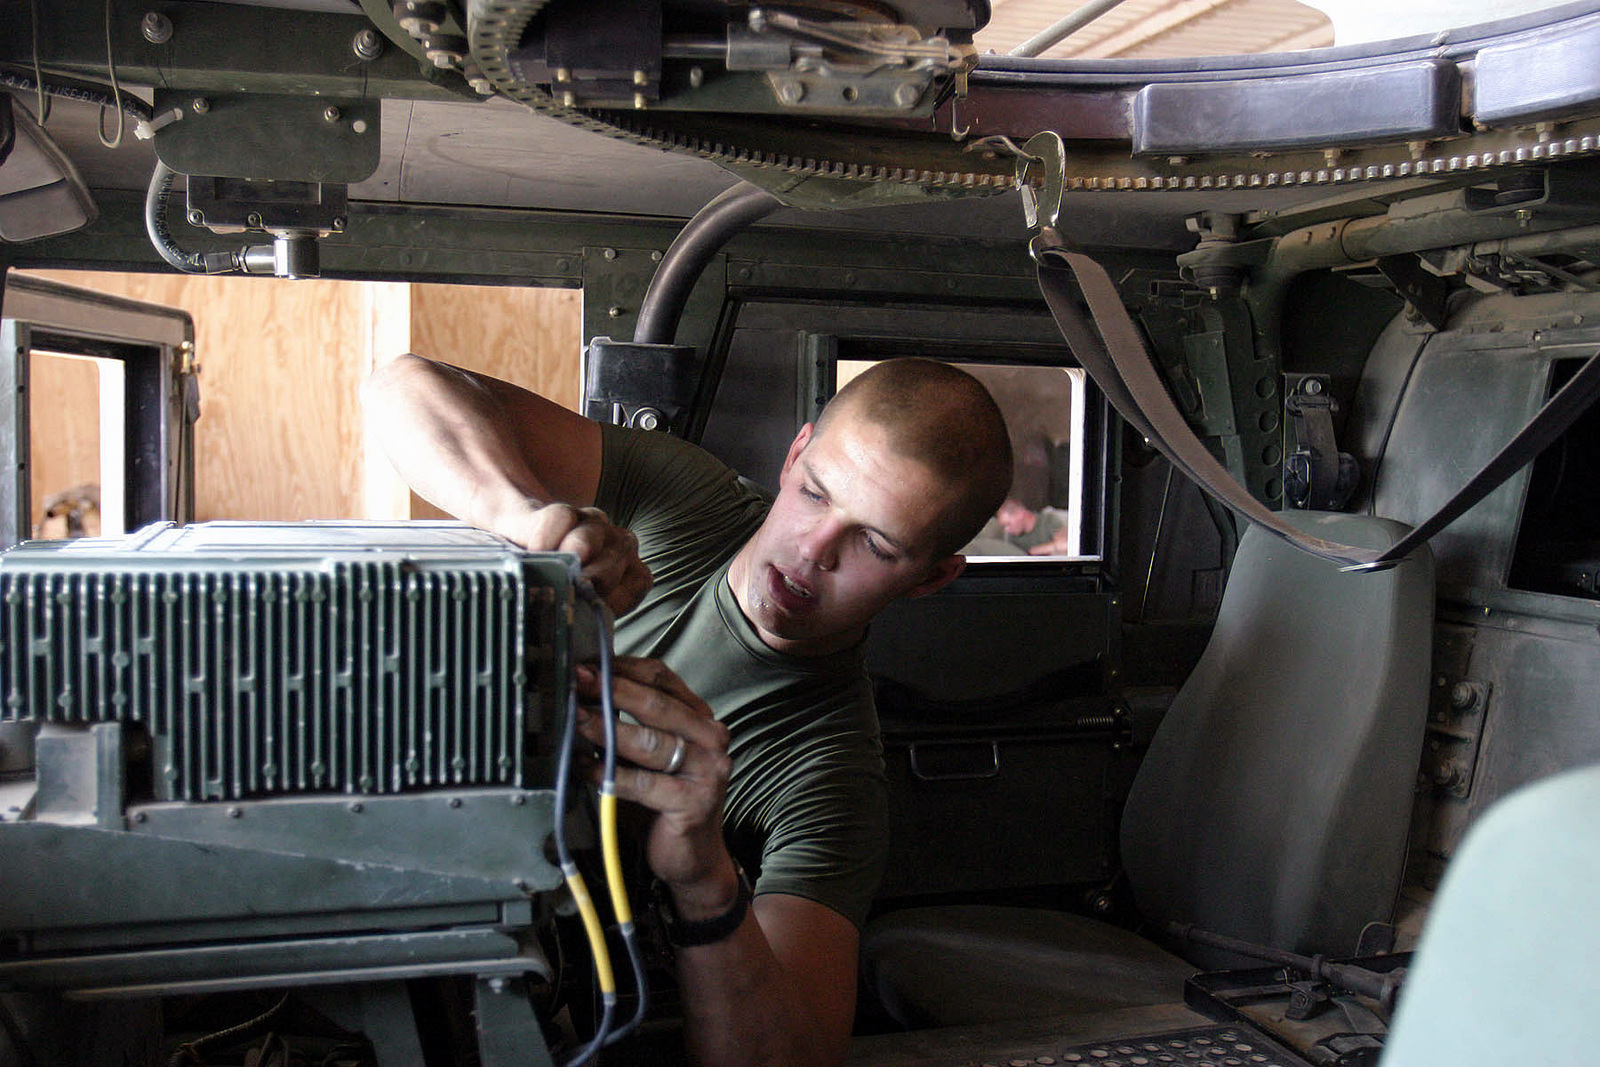 US Marine Corps (USMC) Lance Corporal (LCPL) Kyle Hutcheon